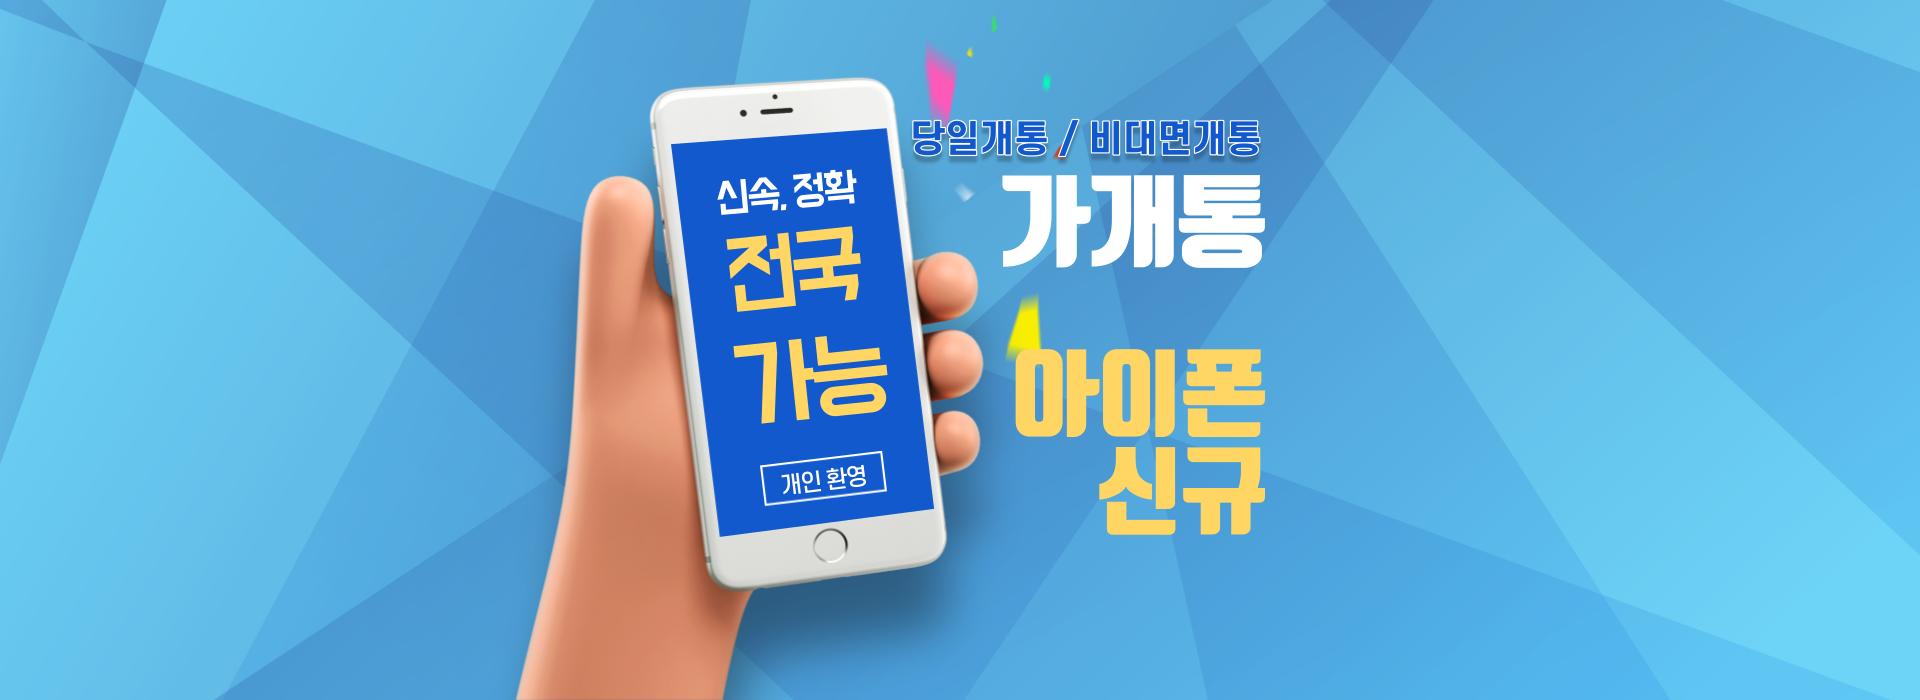 je-mok-eul--ip-ryeok-hae-ju-se-yo.-1614046133.png